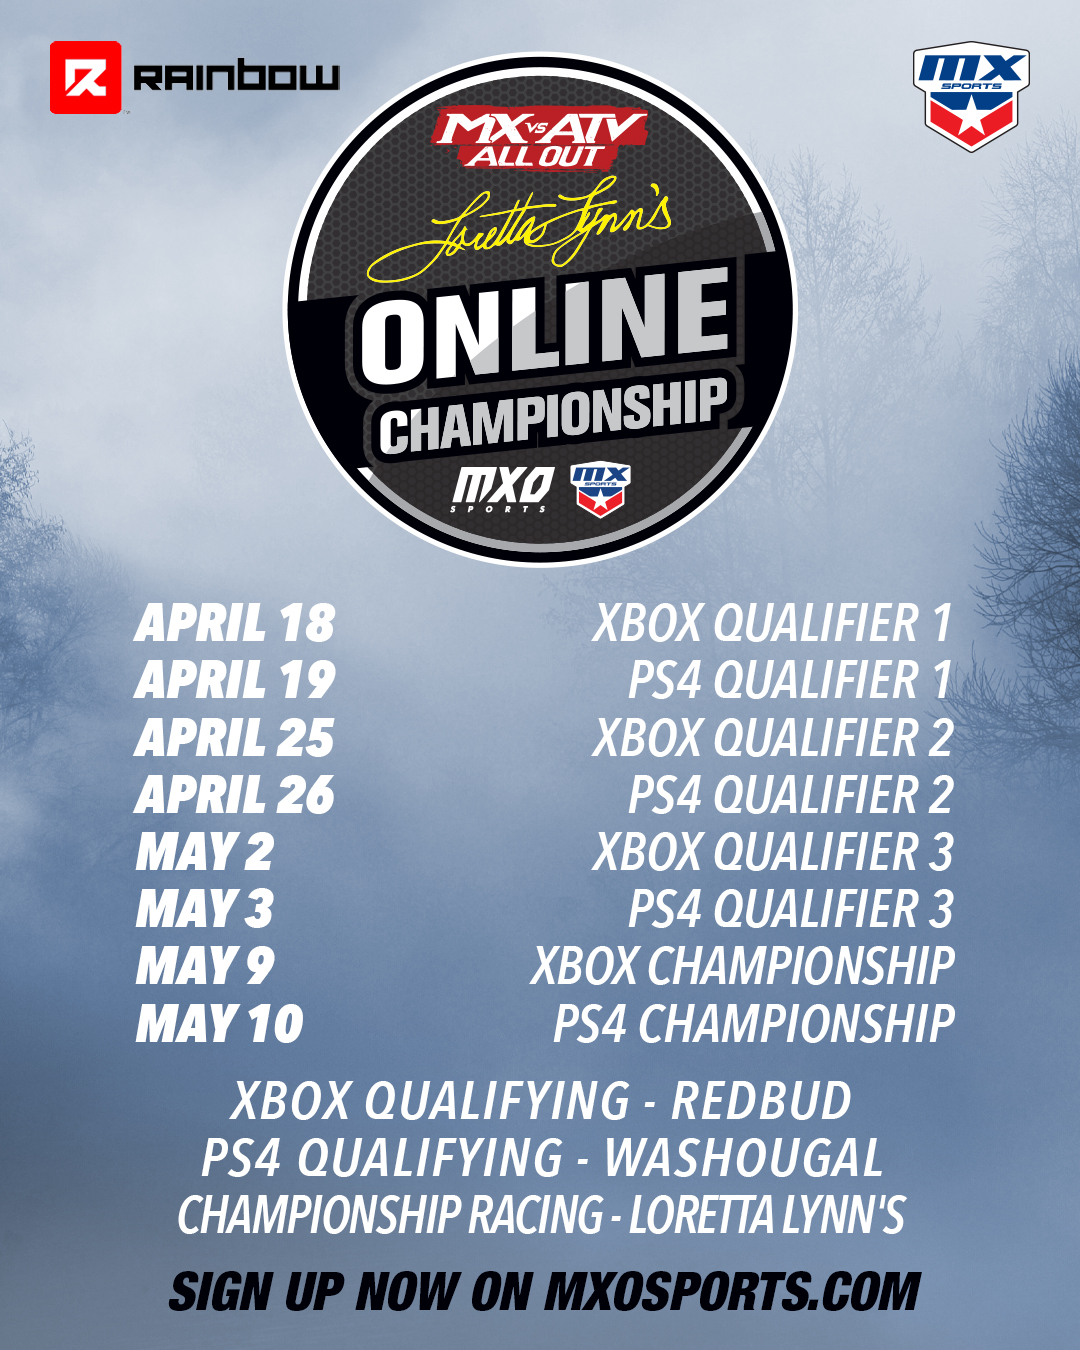 2020 Loretta Lynn's MX vs. ATV Online Championship